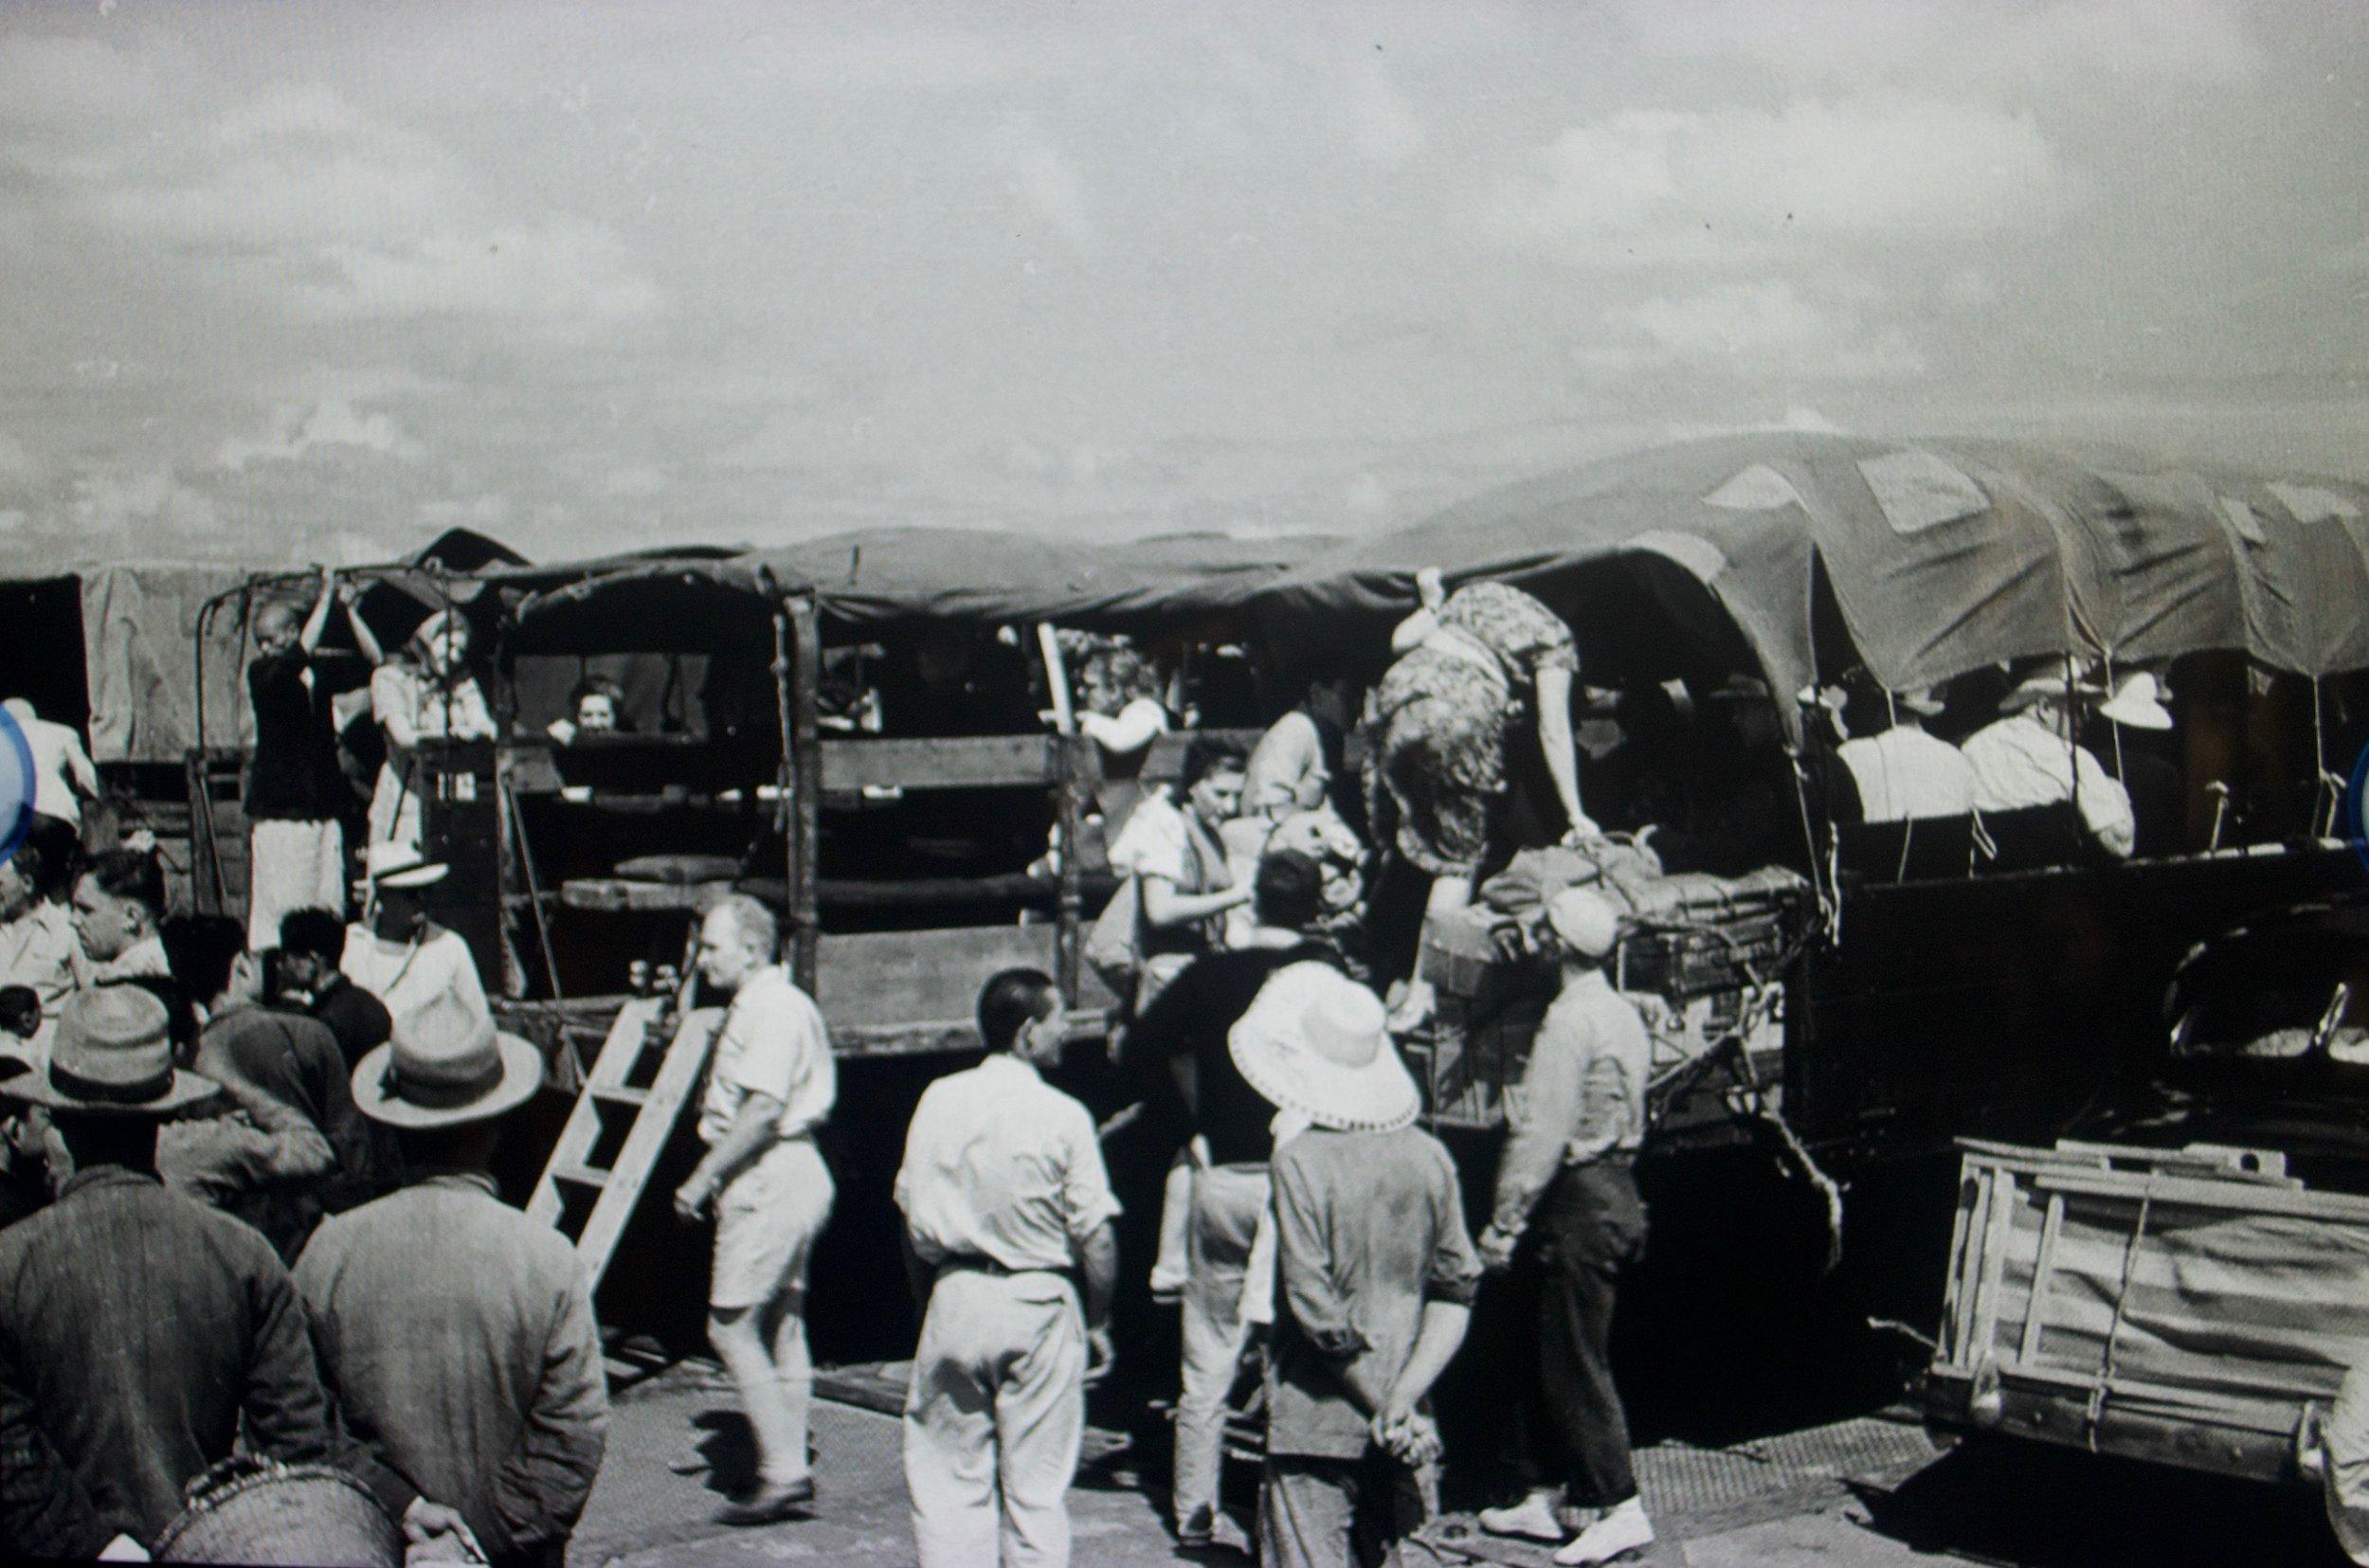 Refugees boarding onto trucks. [Shanghai Jewish Refugees Museum]